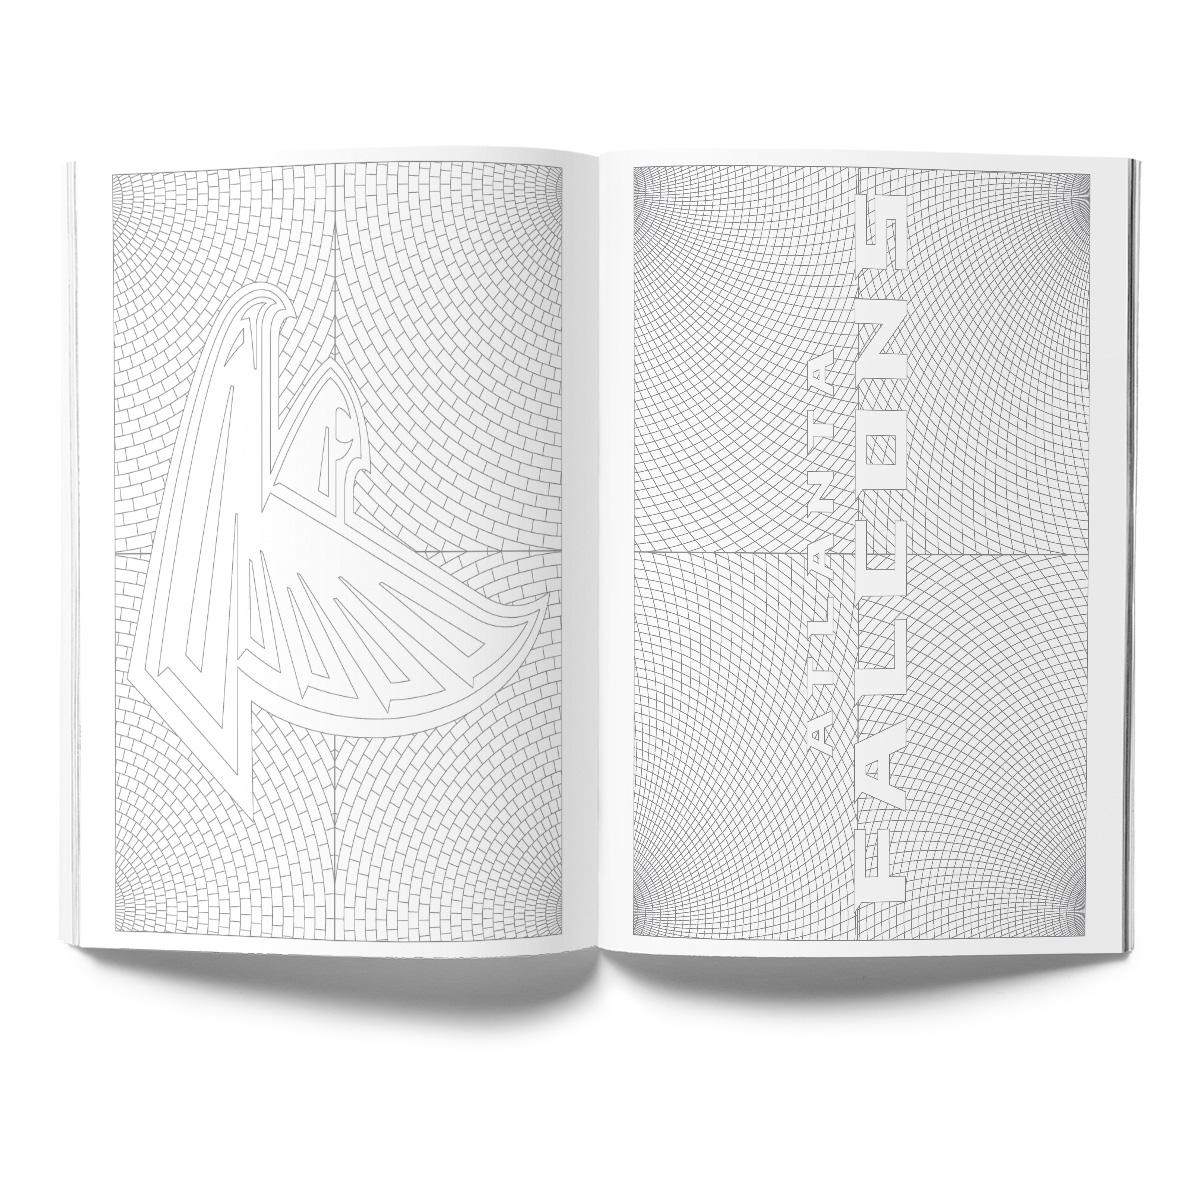 Atlanta Falcons Adult Coloring Book